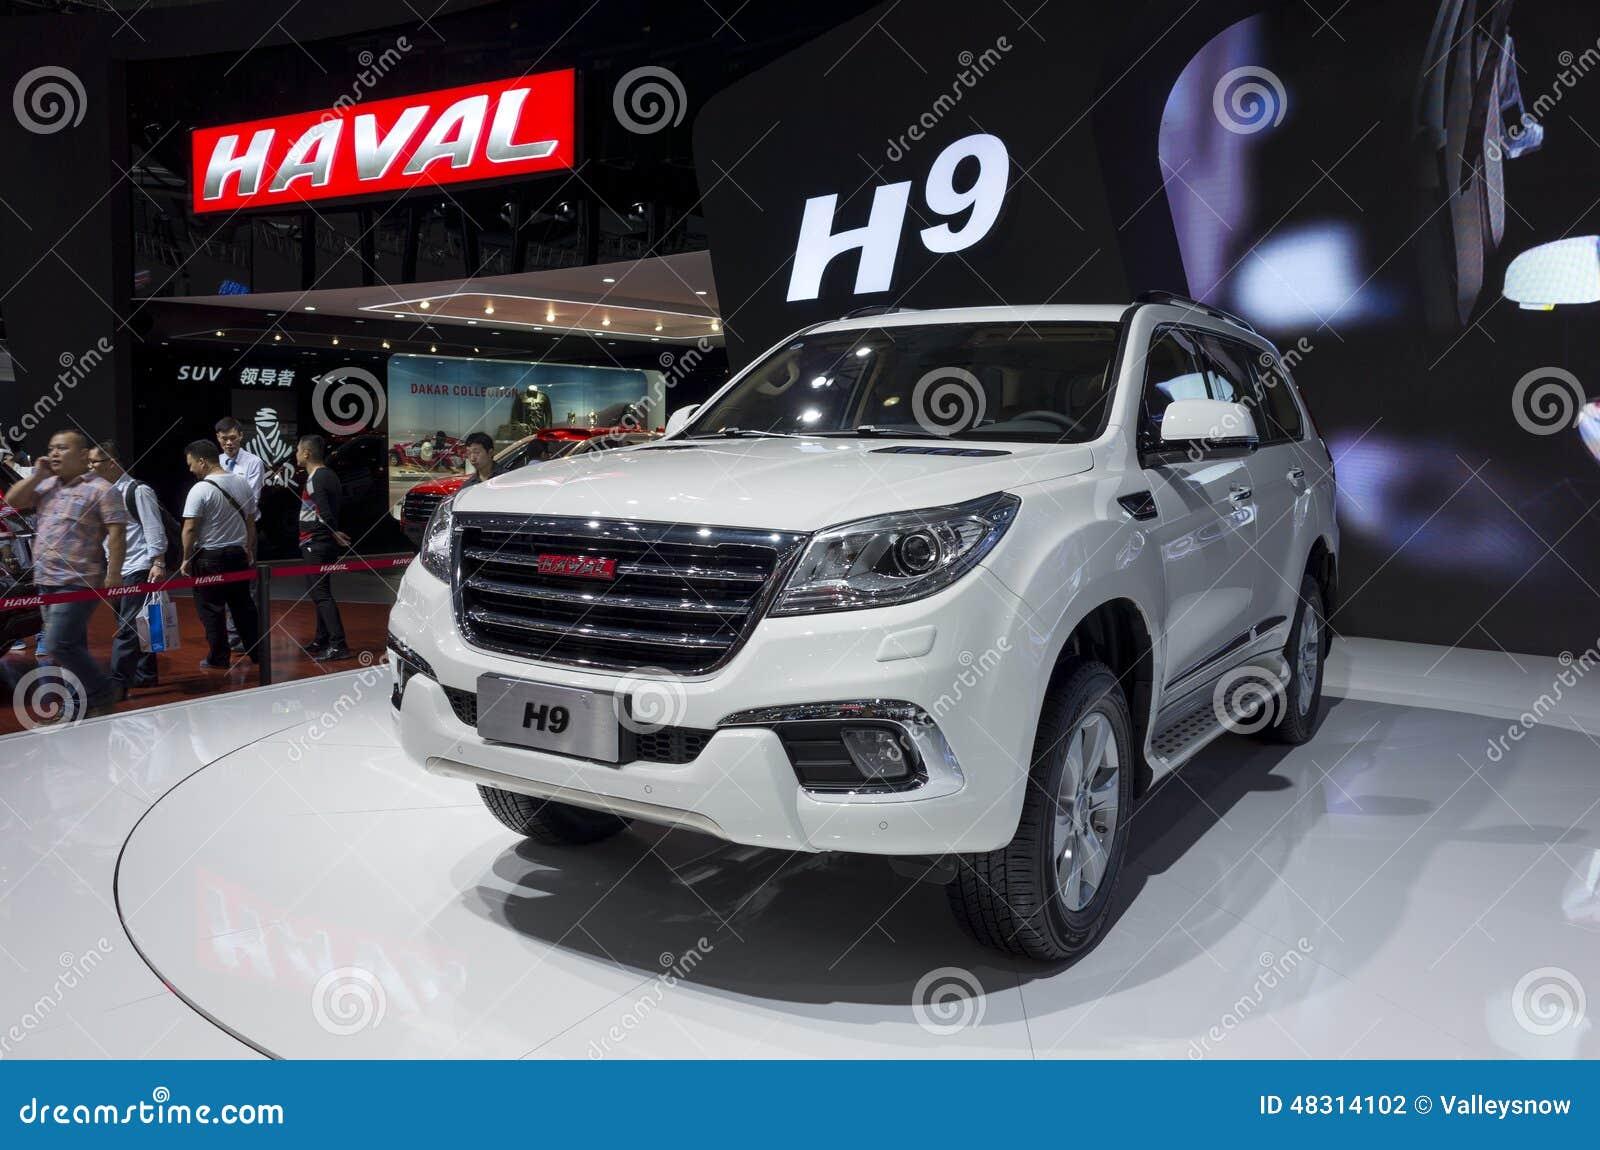 HAVAL H9 SUV